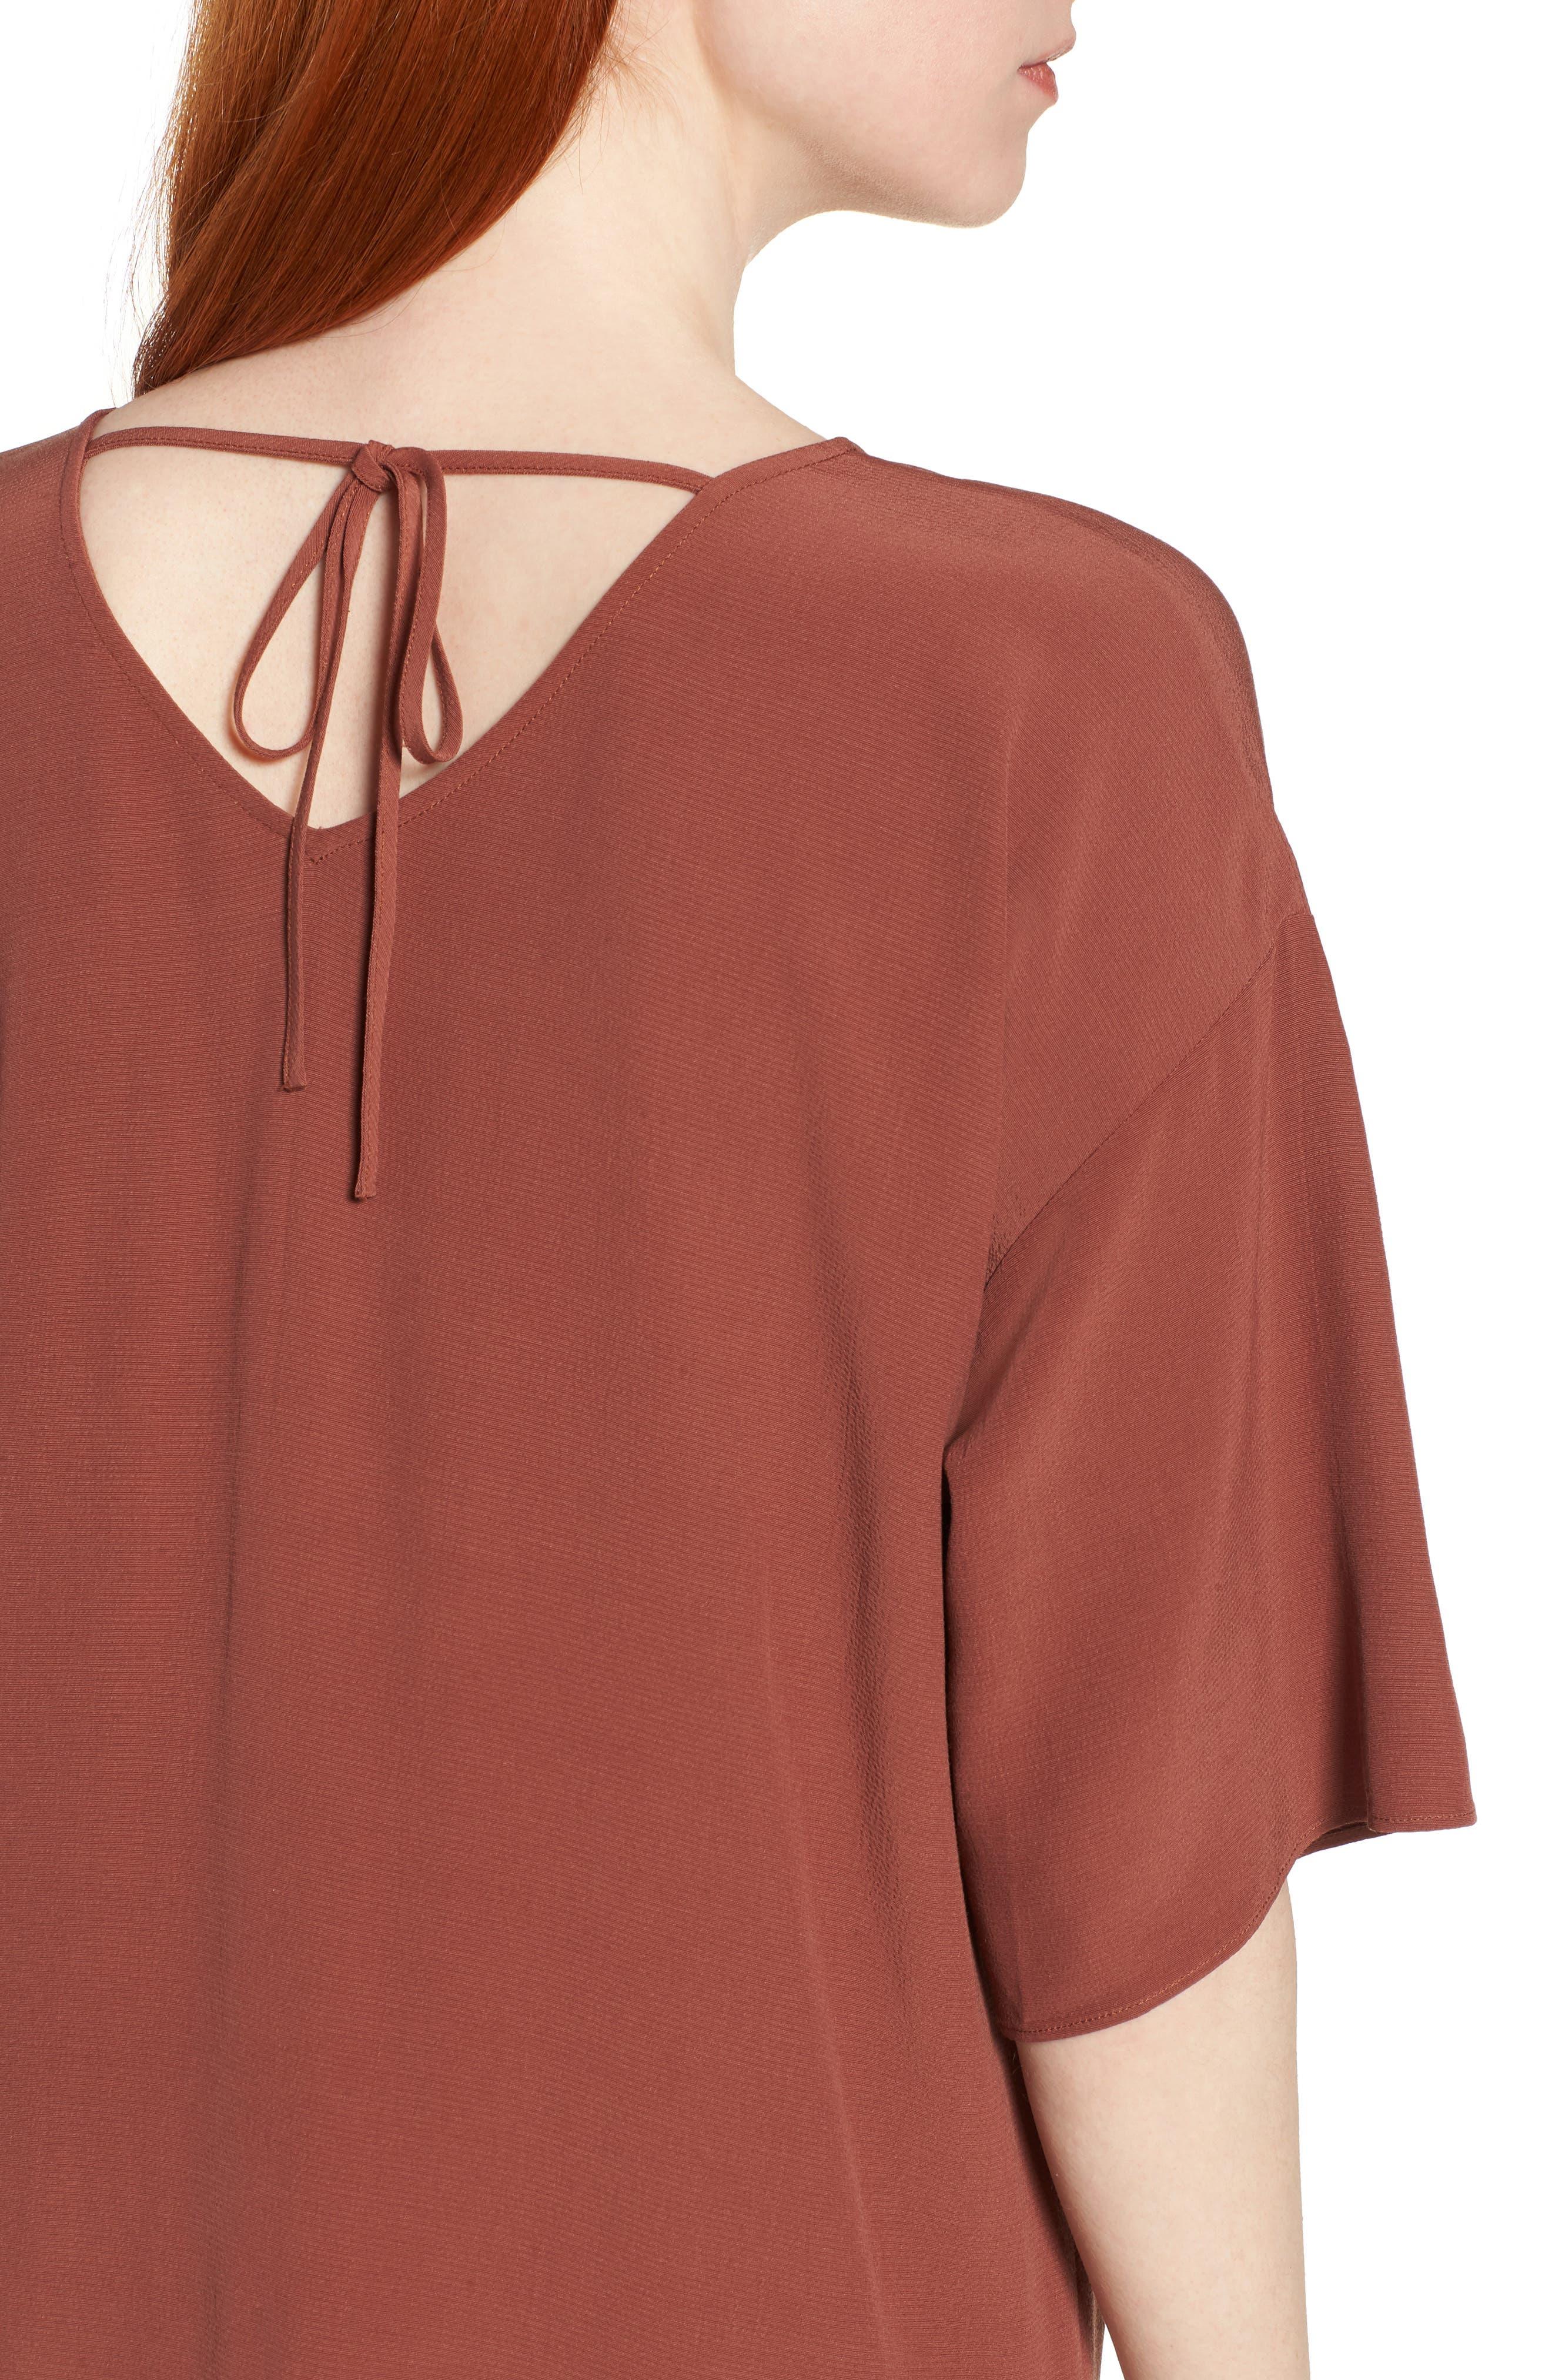 Drop Waist Tencel<sup>®</sup> Lyocell Blend Dress,                             Alternate thumbnail 15, color,